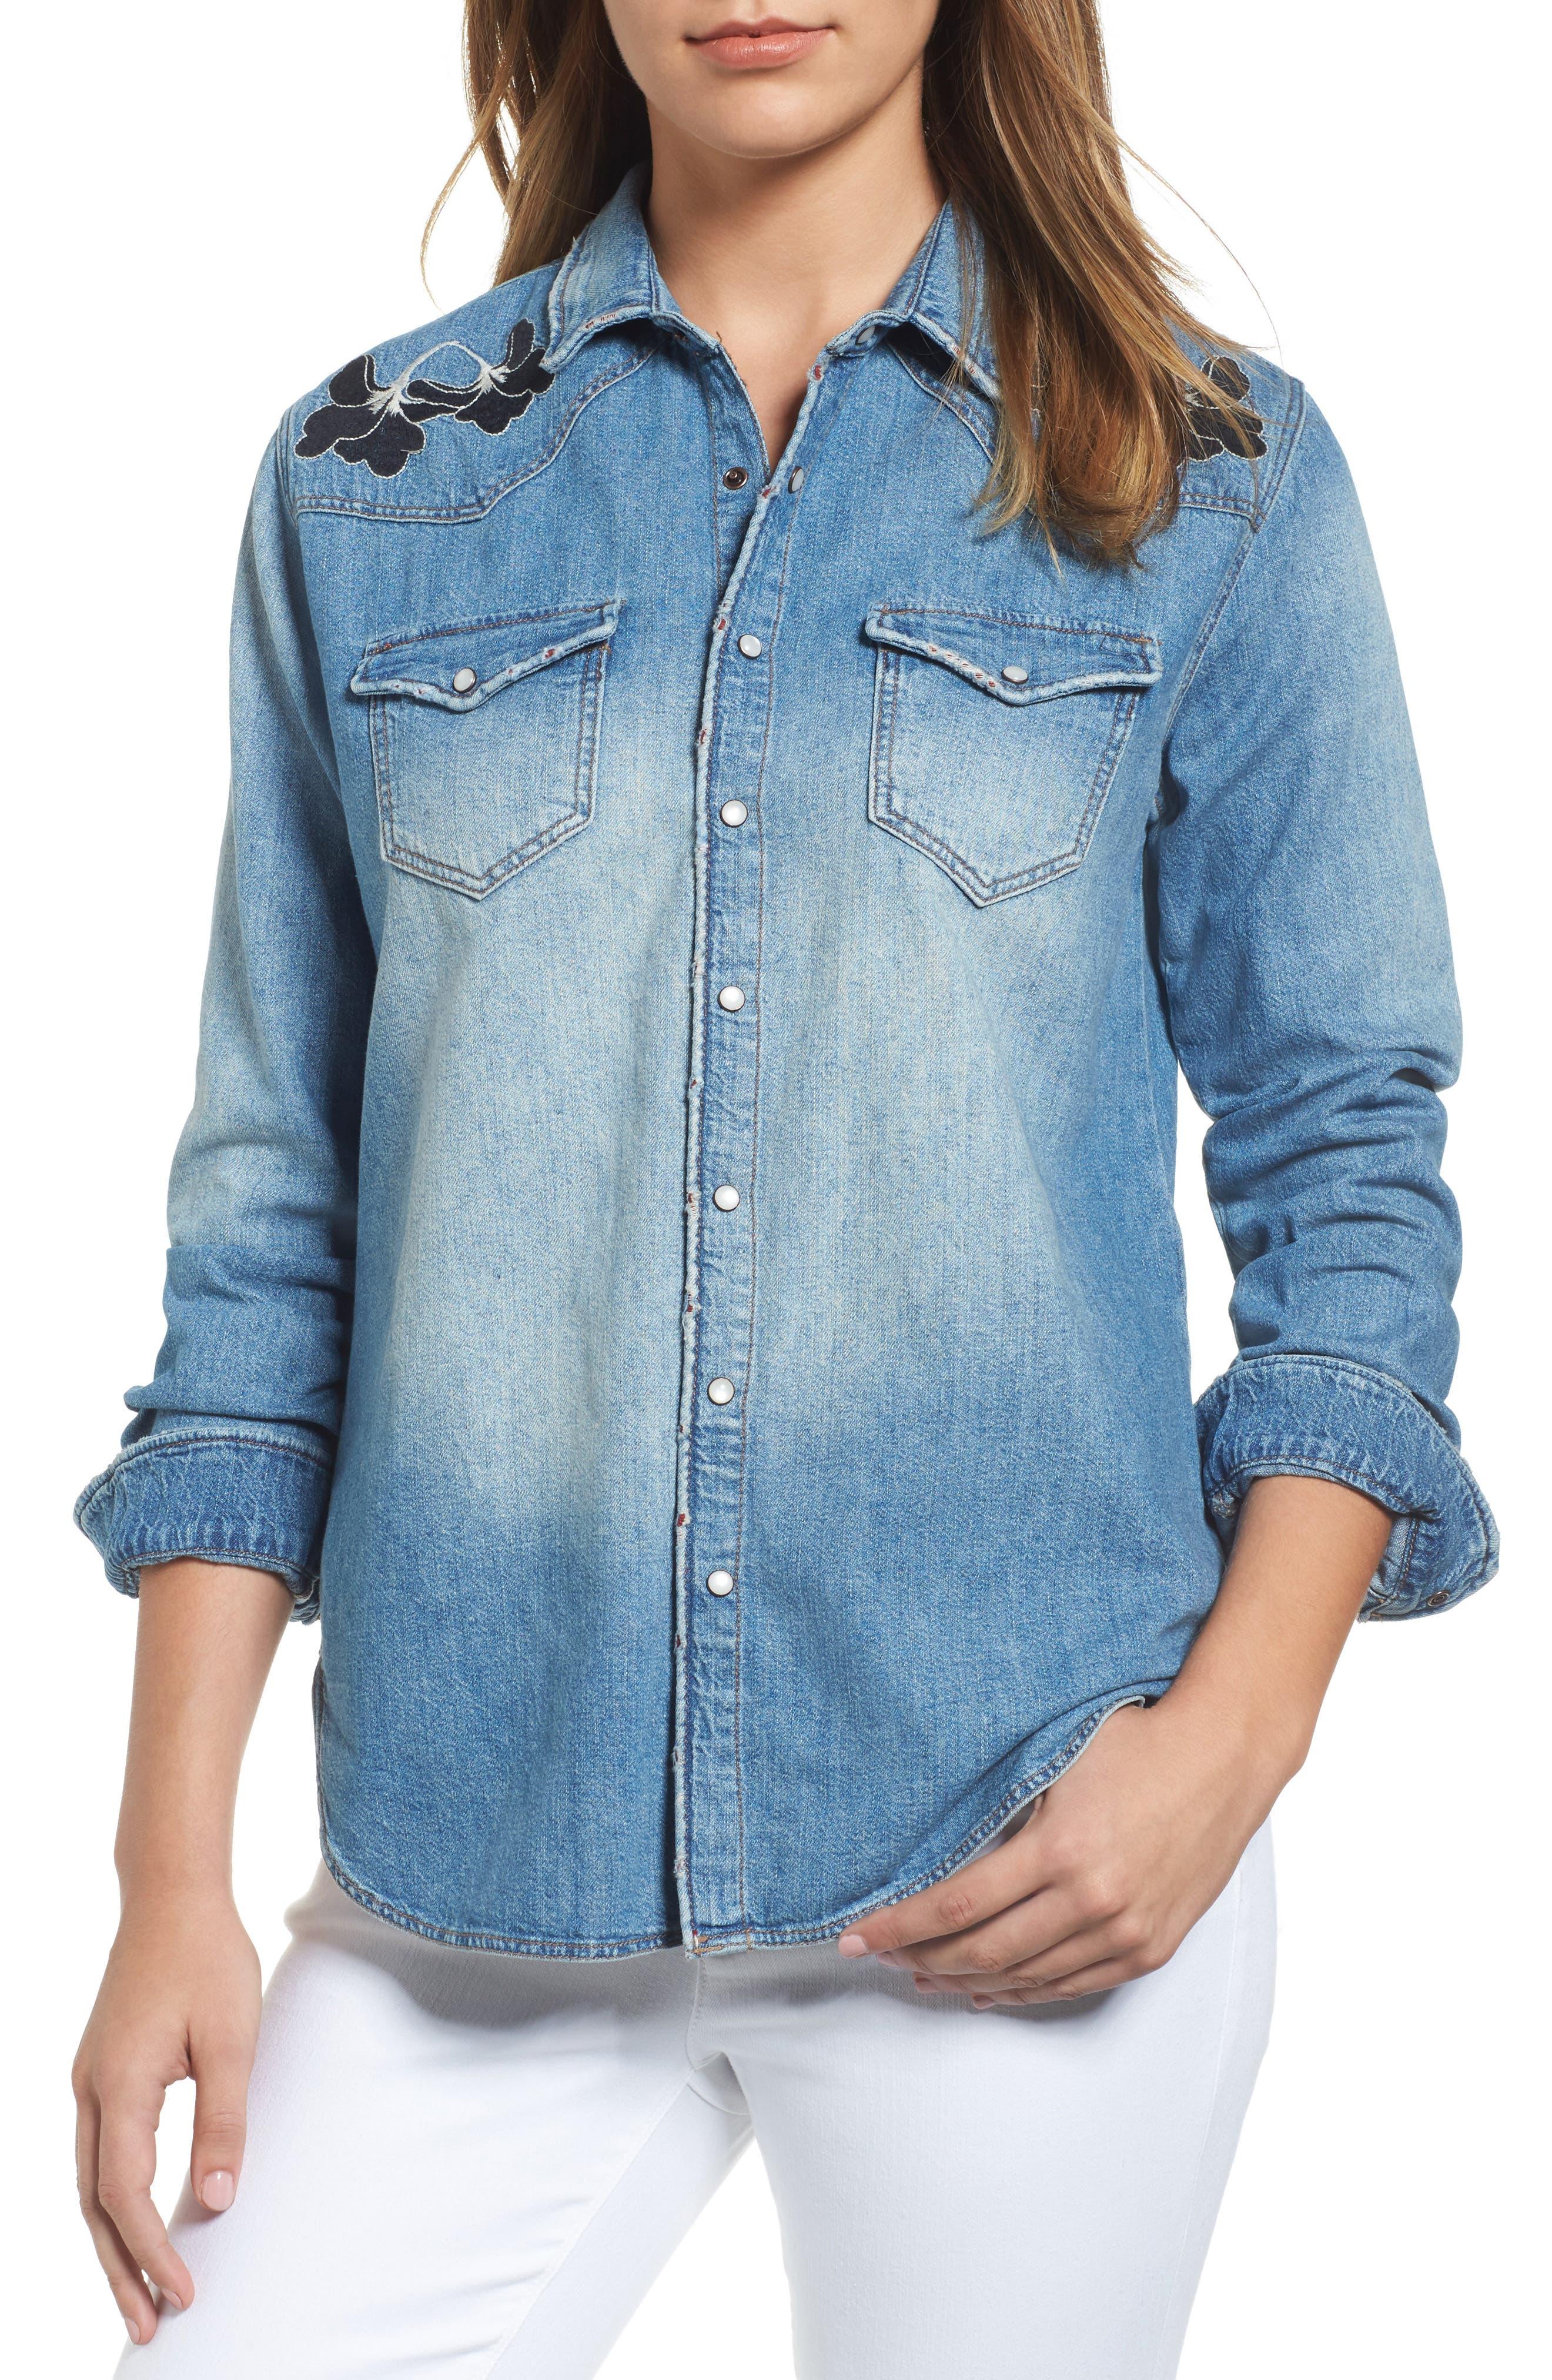 Main Image - Mavi Jeans Vintage Rose Embroidered Denim Shirt